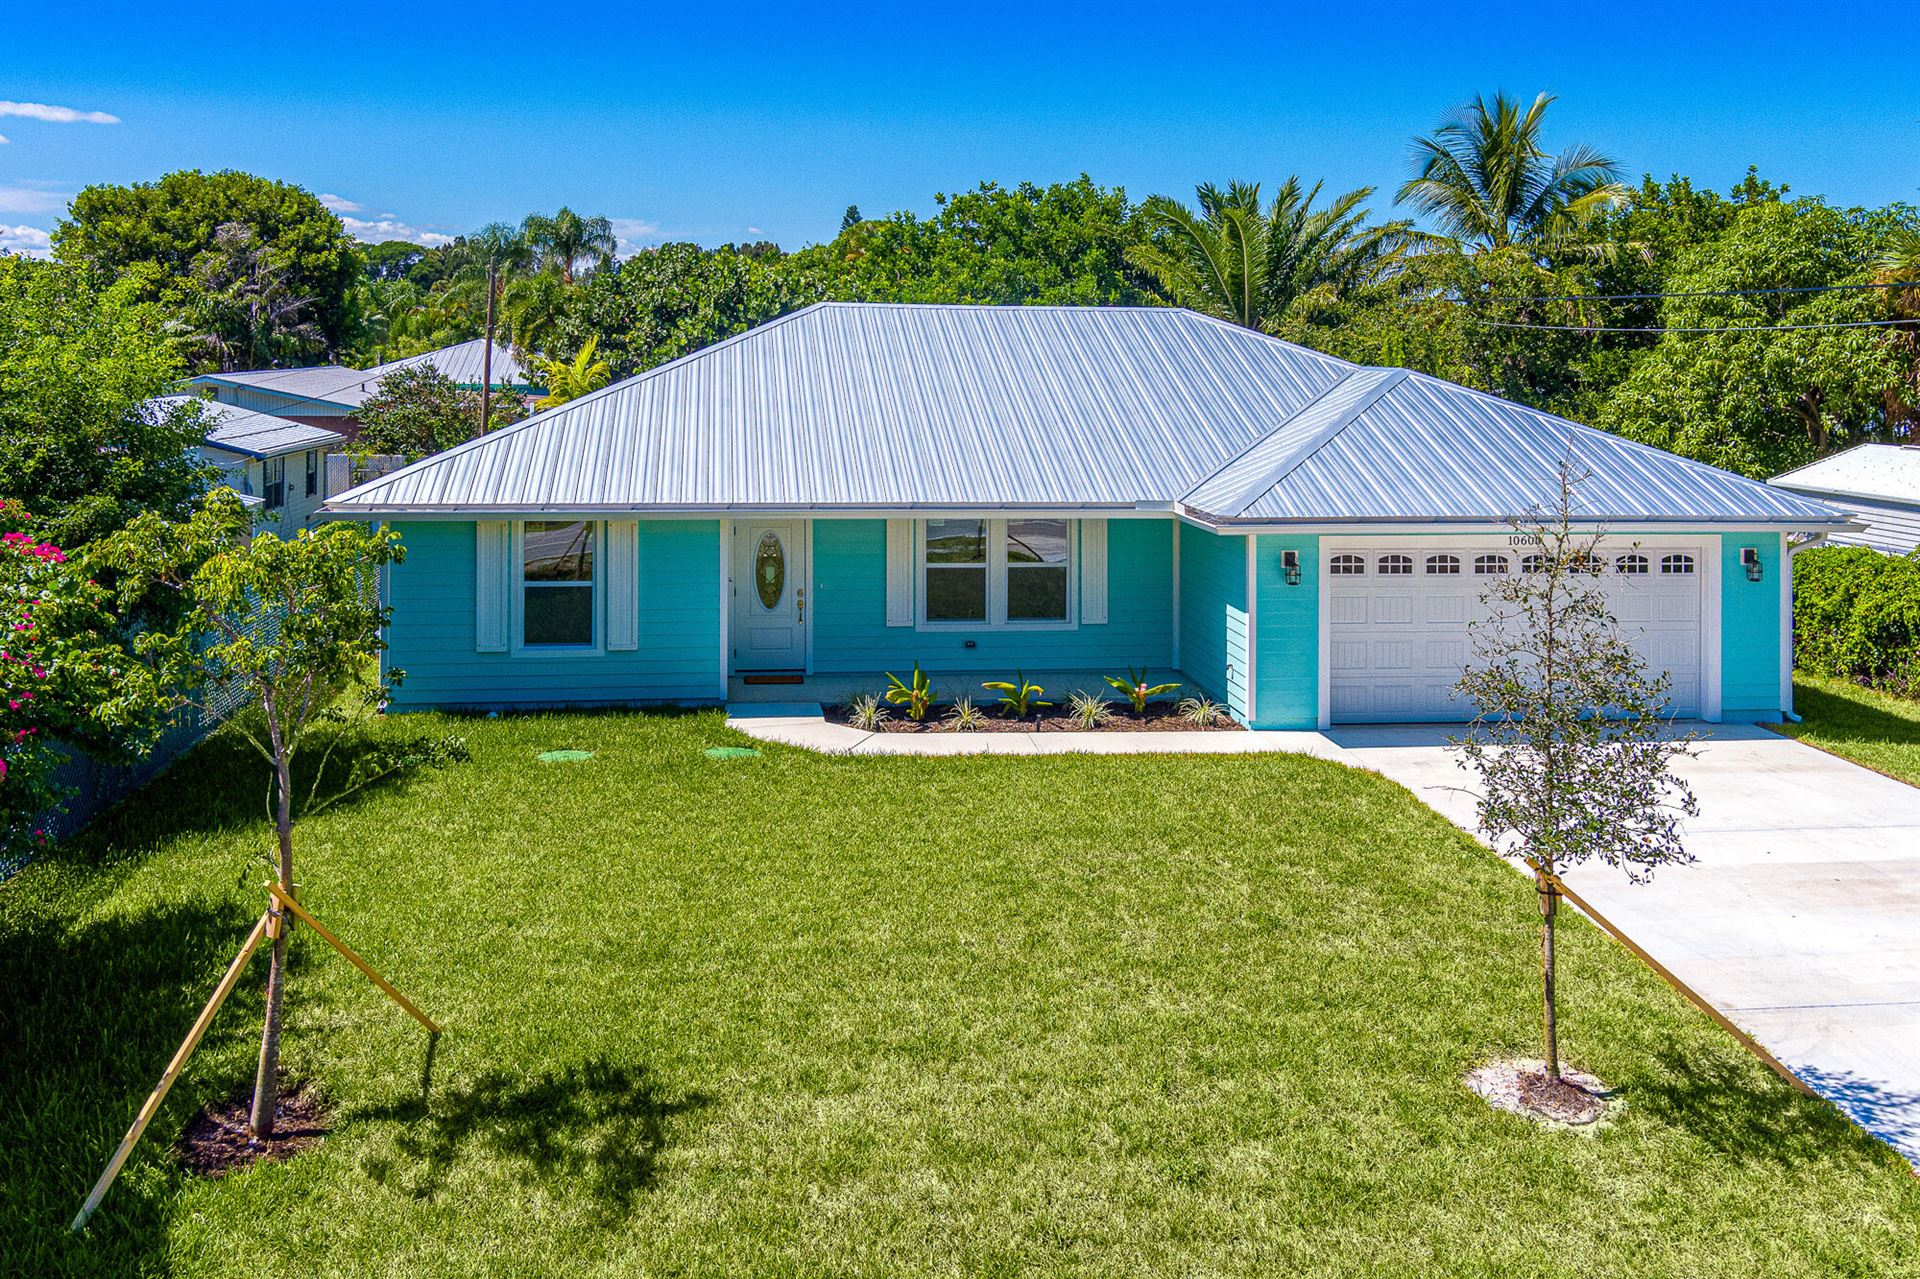 Photo of 10600 SE Gomez Avenue, Hobe Sound, FL 33455 (MLS # RX-10748789)